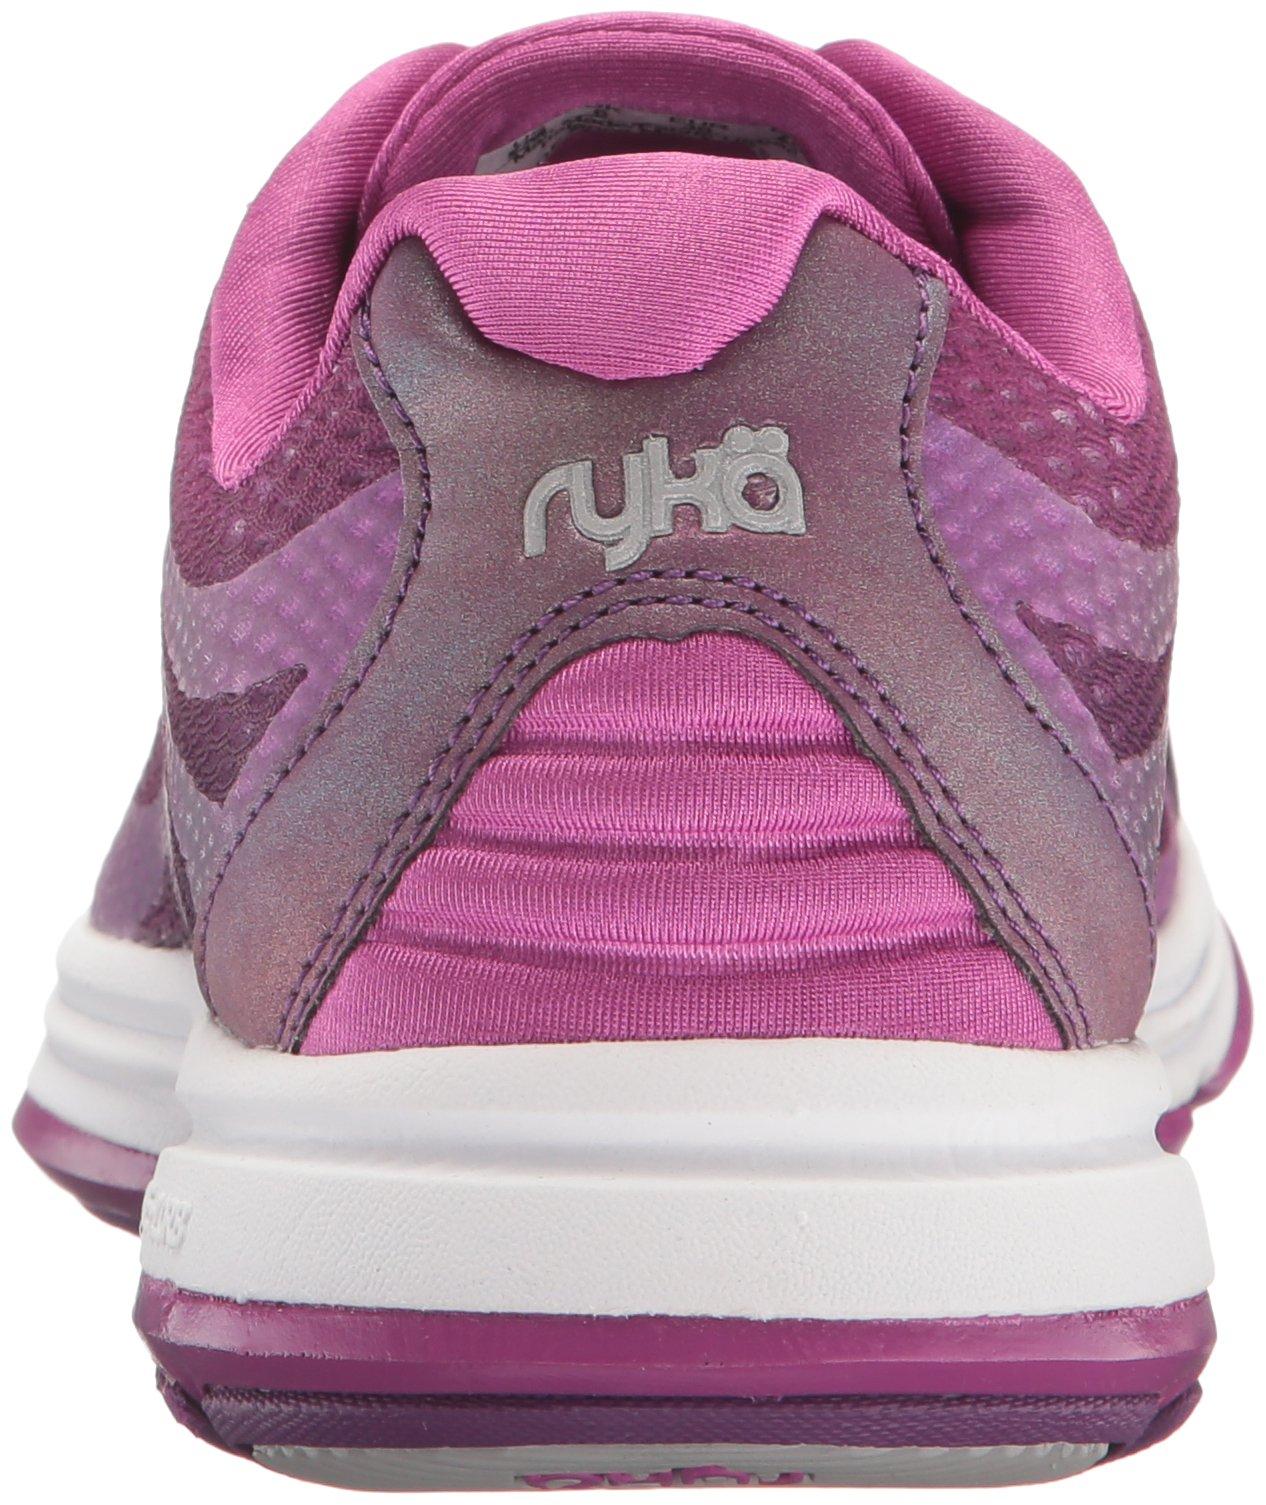 Ryka Women's Devotion Plus 2 Cross Trainer,Grape Juice/Vivid Berry/Chrome Silver by Ryka (Image #2)